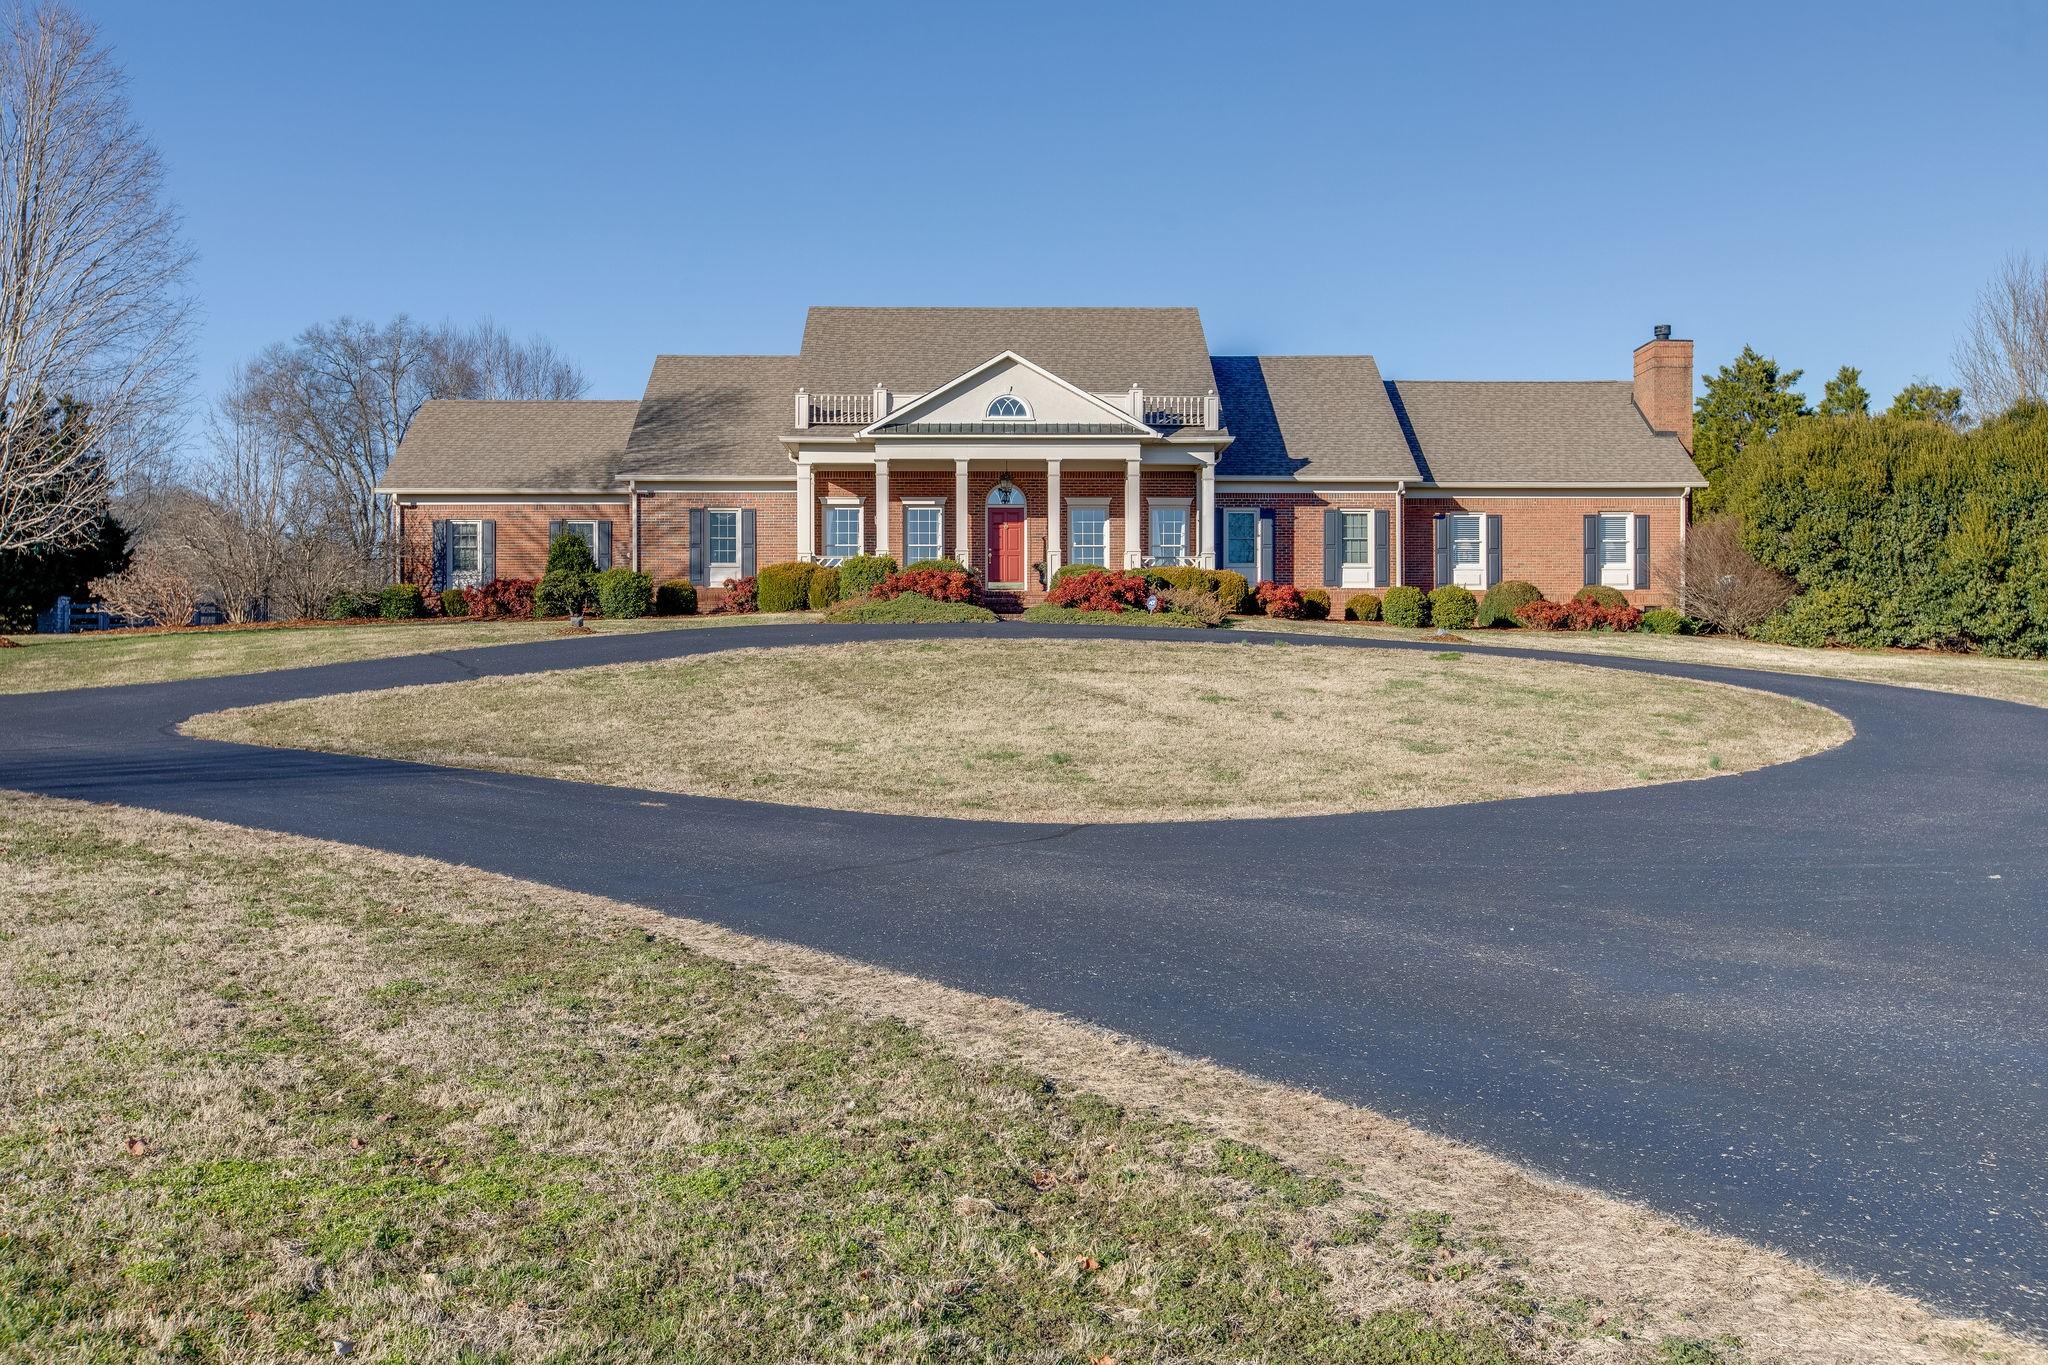 406 Yokley Rd, Lynnville, TN 38472 - Lynnville, TN real estate listing